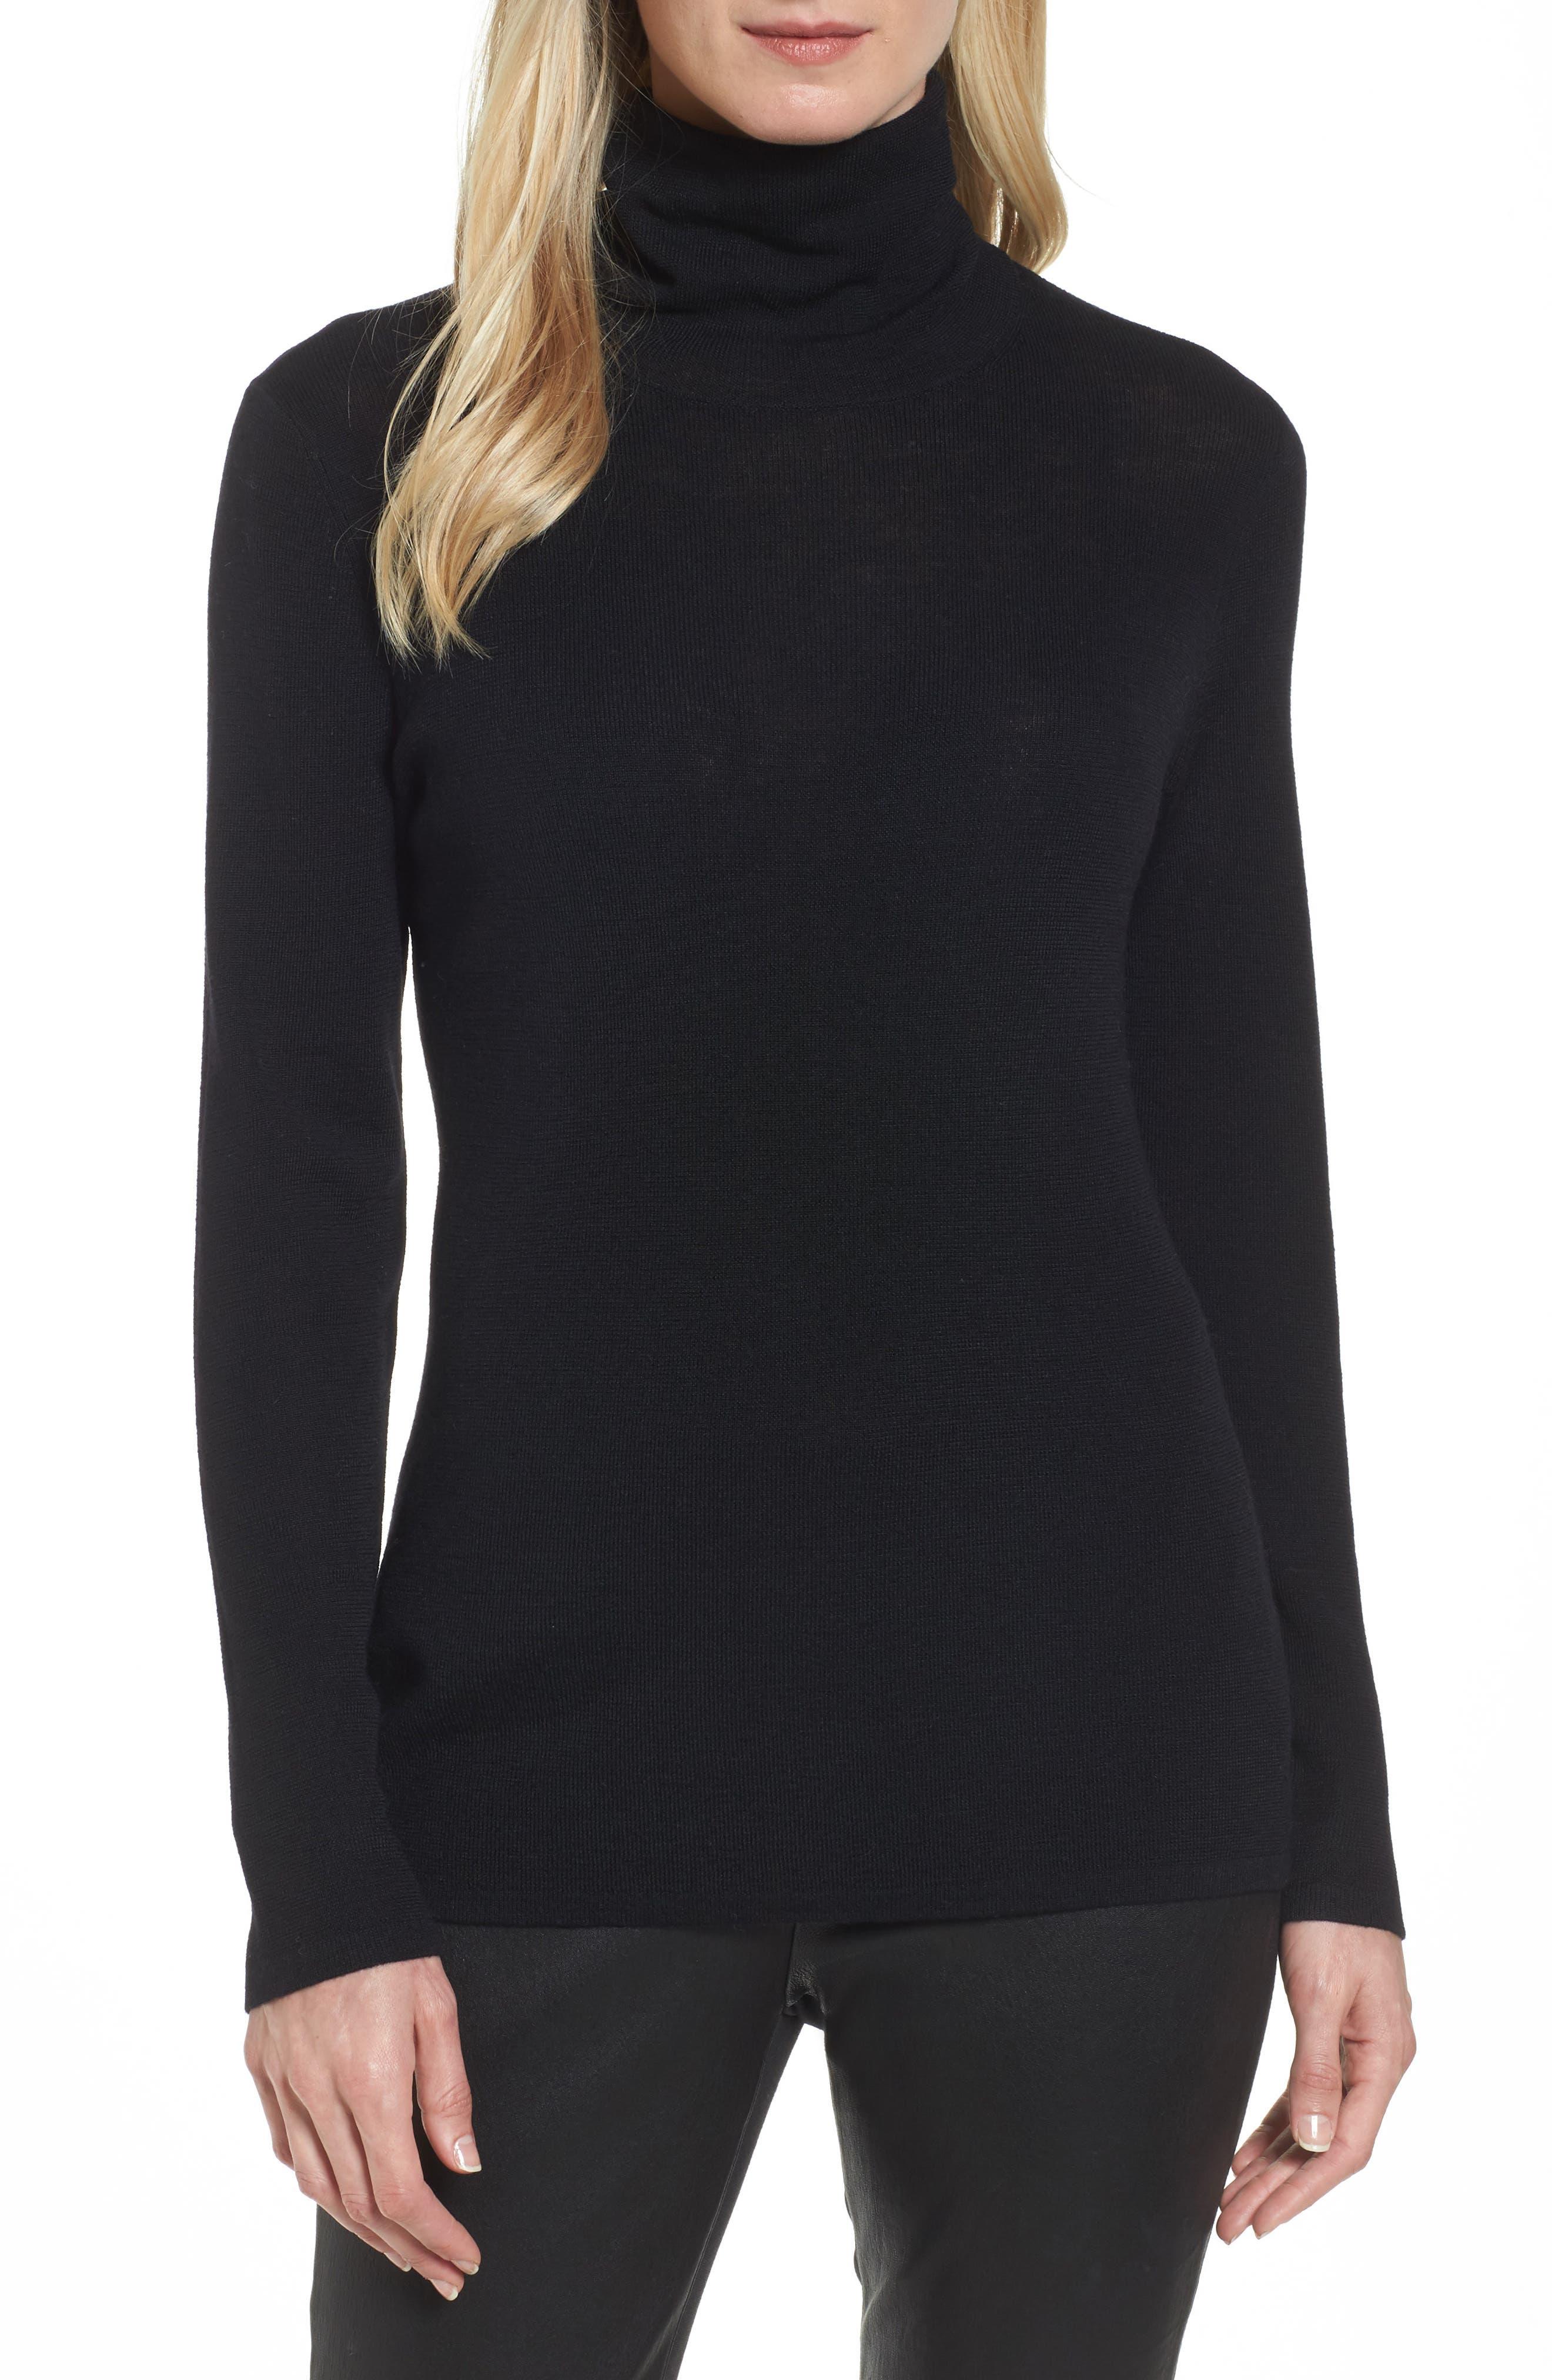 The Fisher Project Ultrafine Merino Turtleneck Sweater,                         Main,                         color, 001